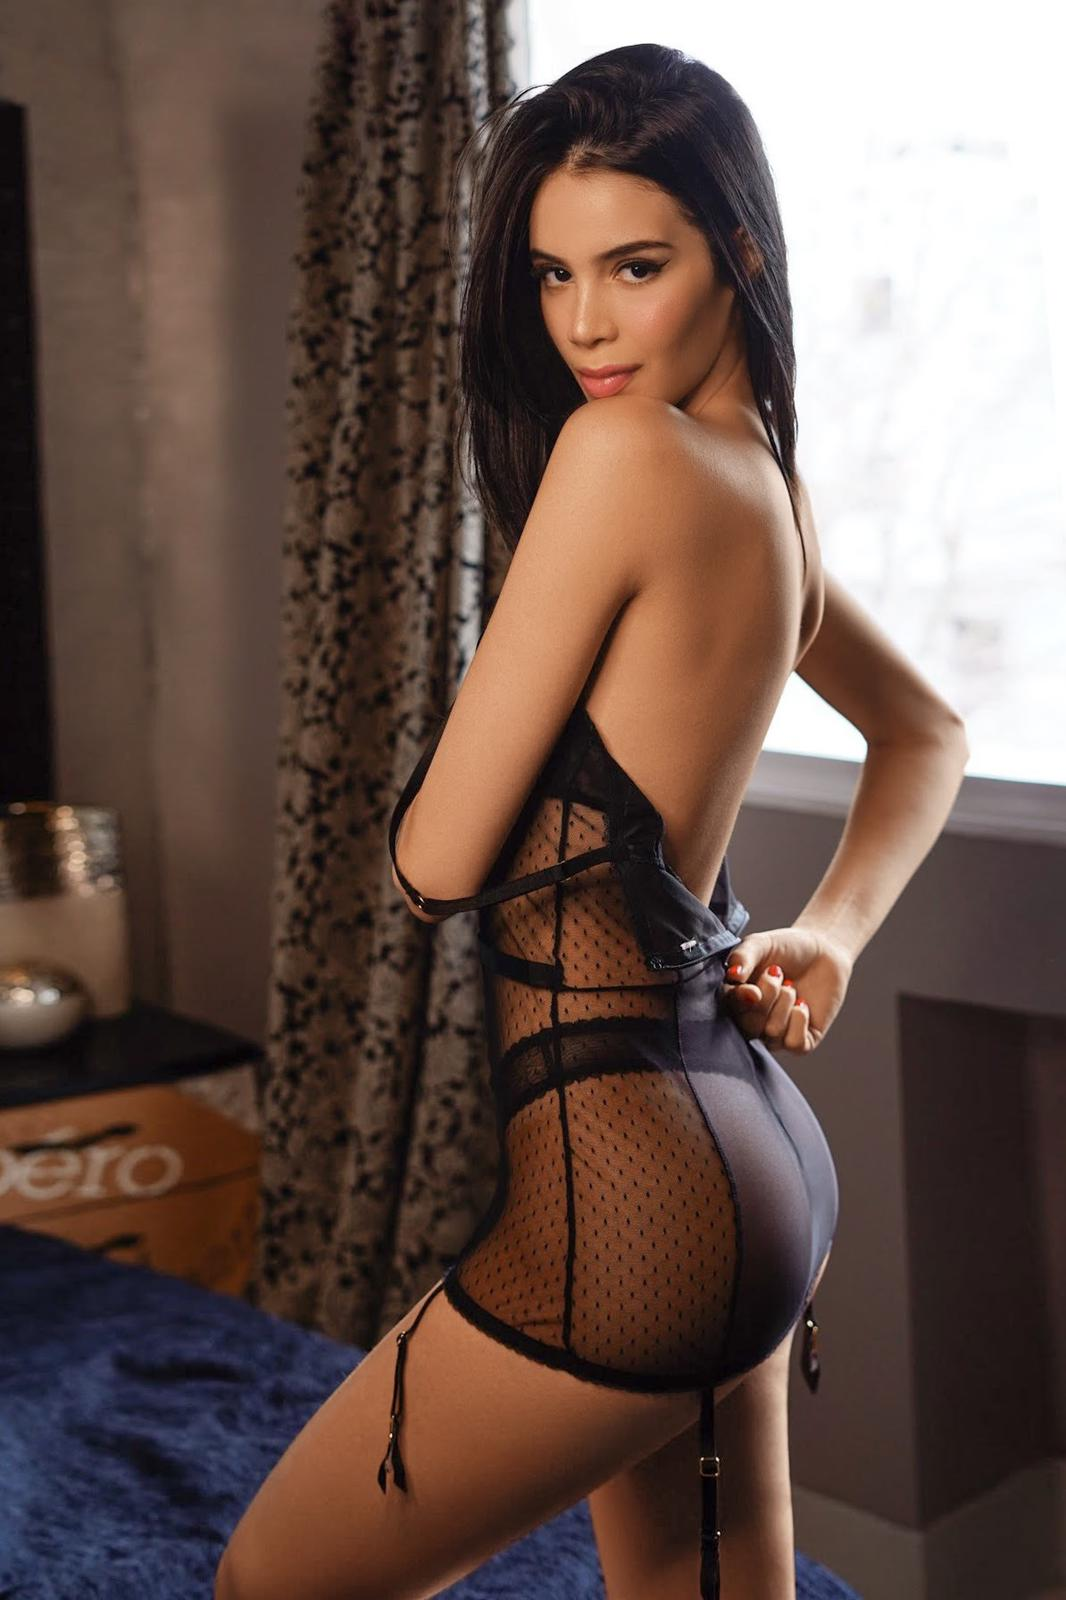 Cindy (36)